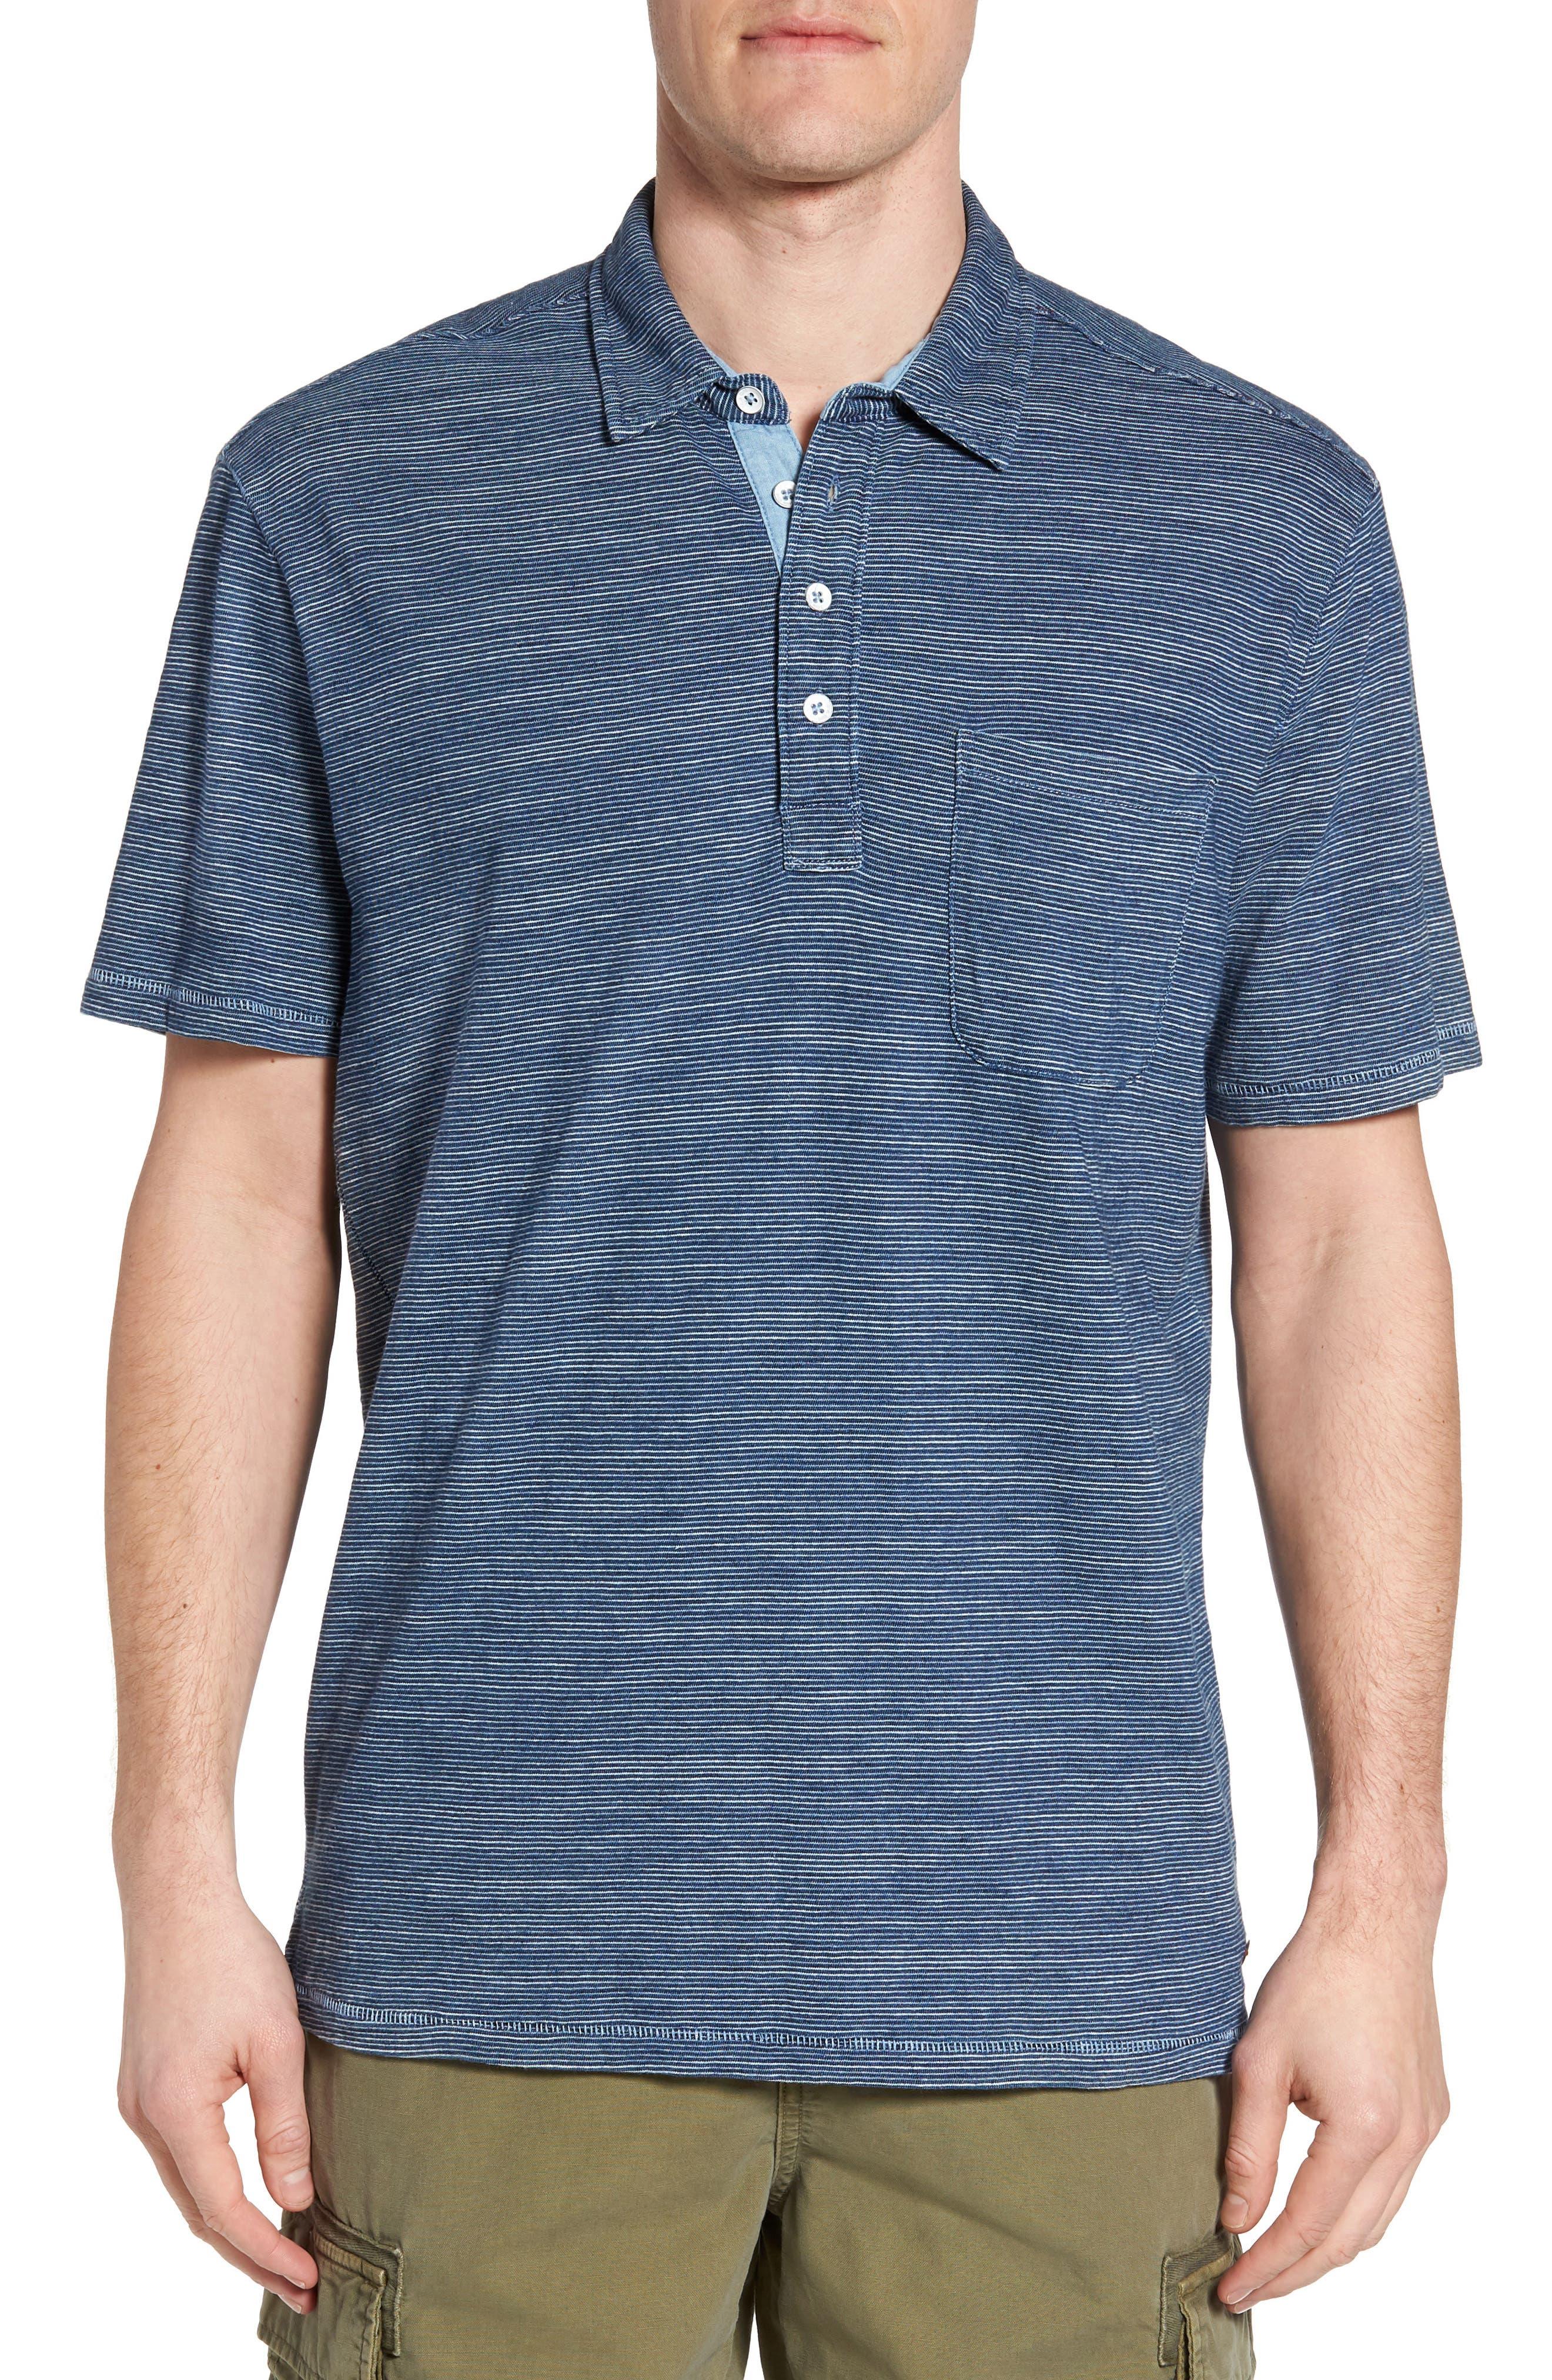 TRUE GRIT Indigo Stripe Jersey Polo, Main, color, 400